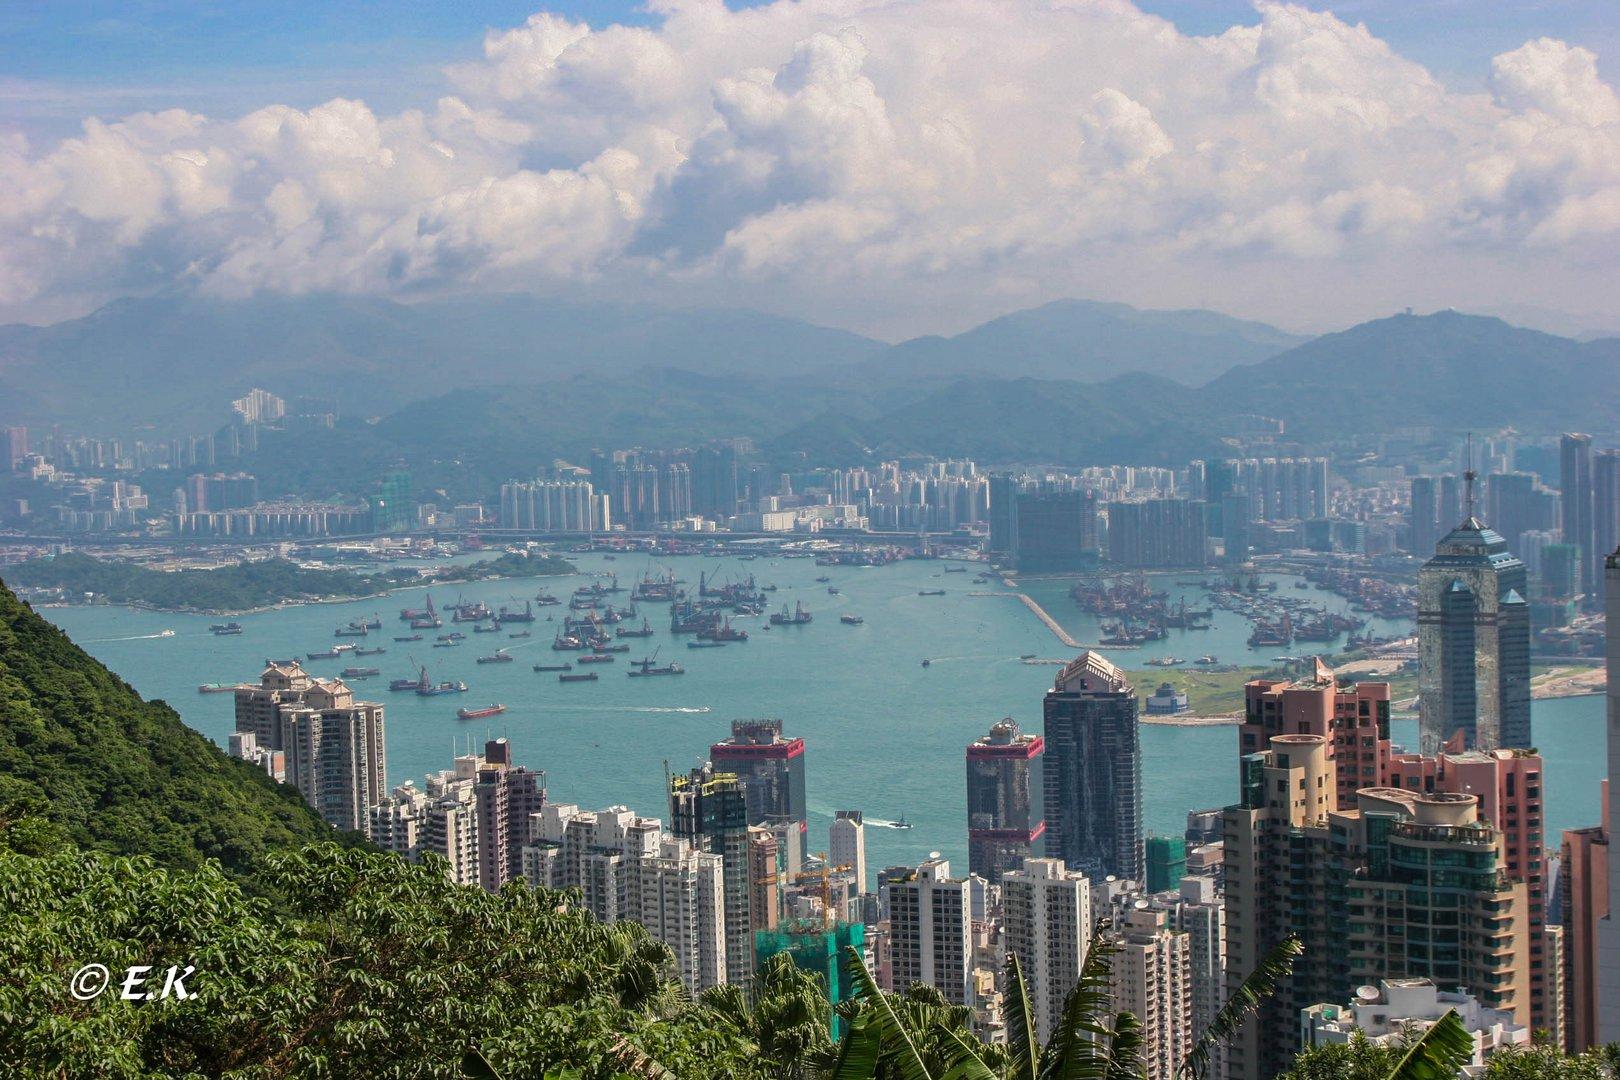 Hongkong ohne Smog